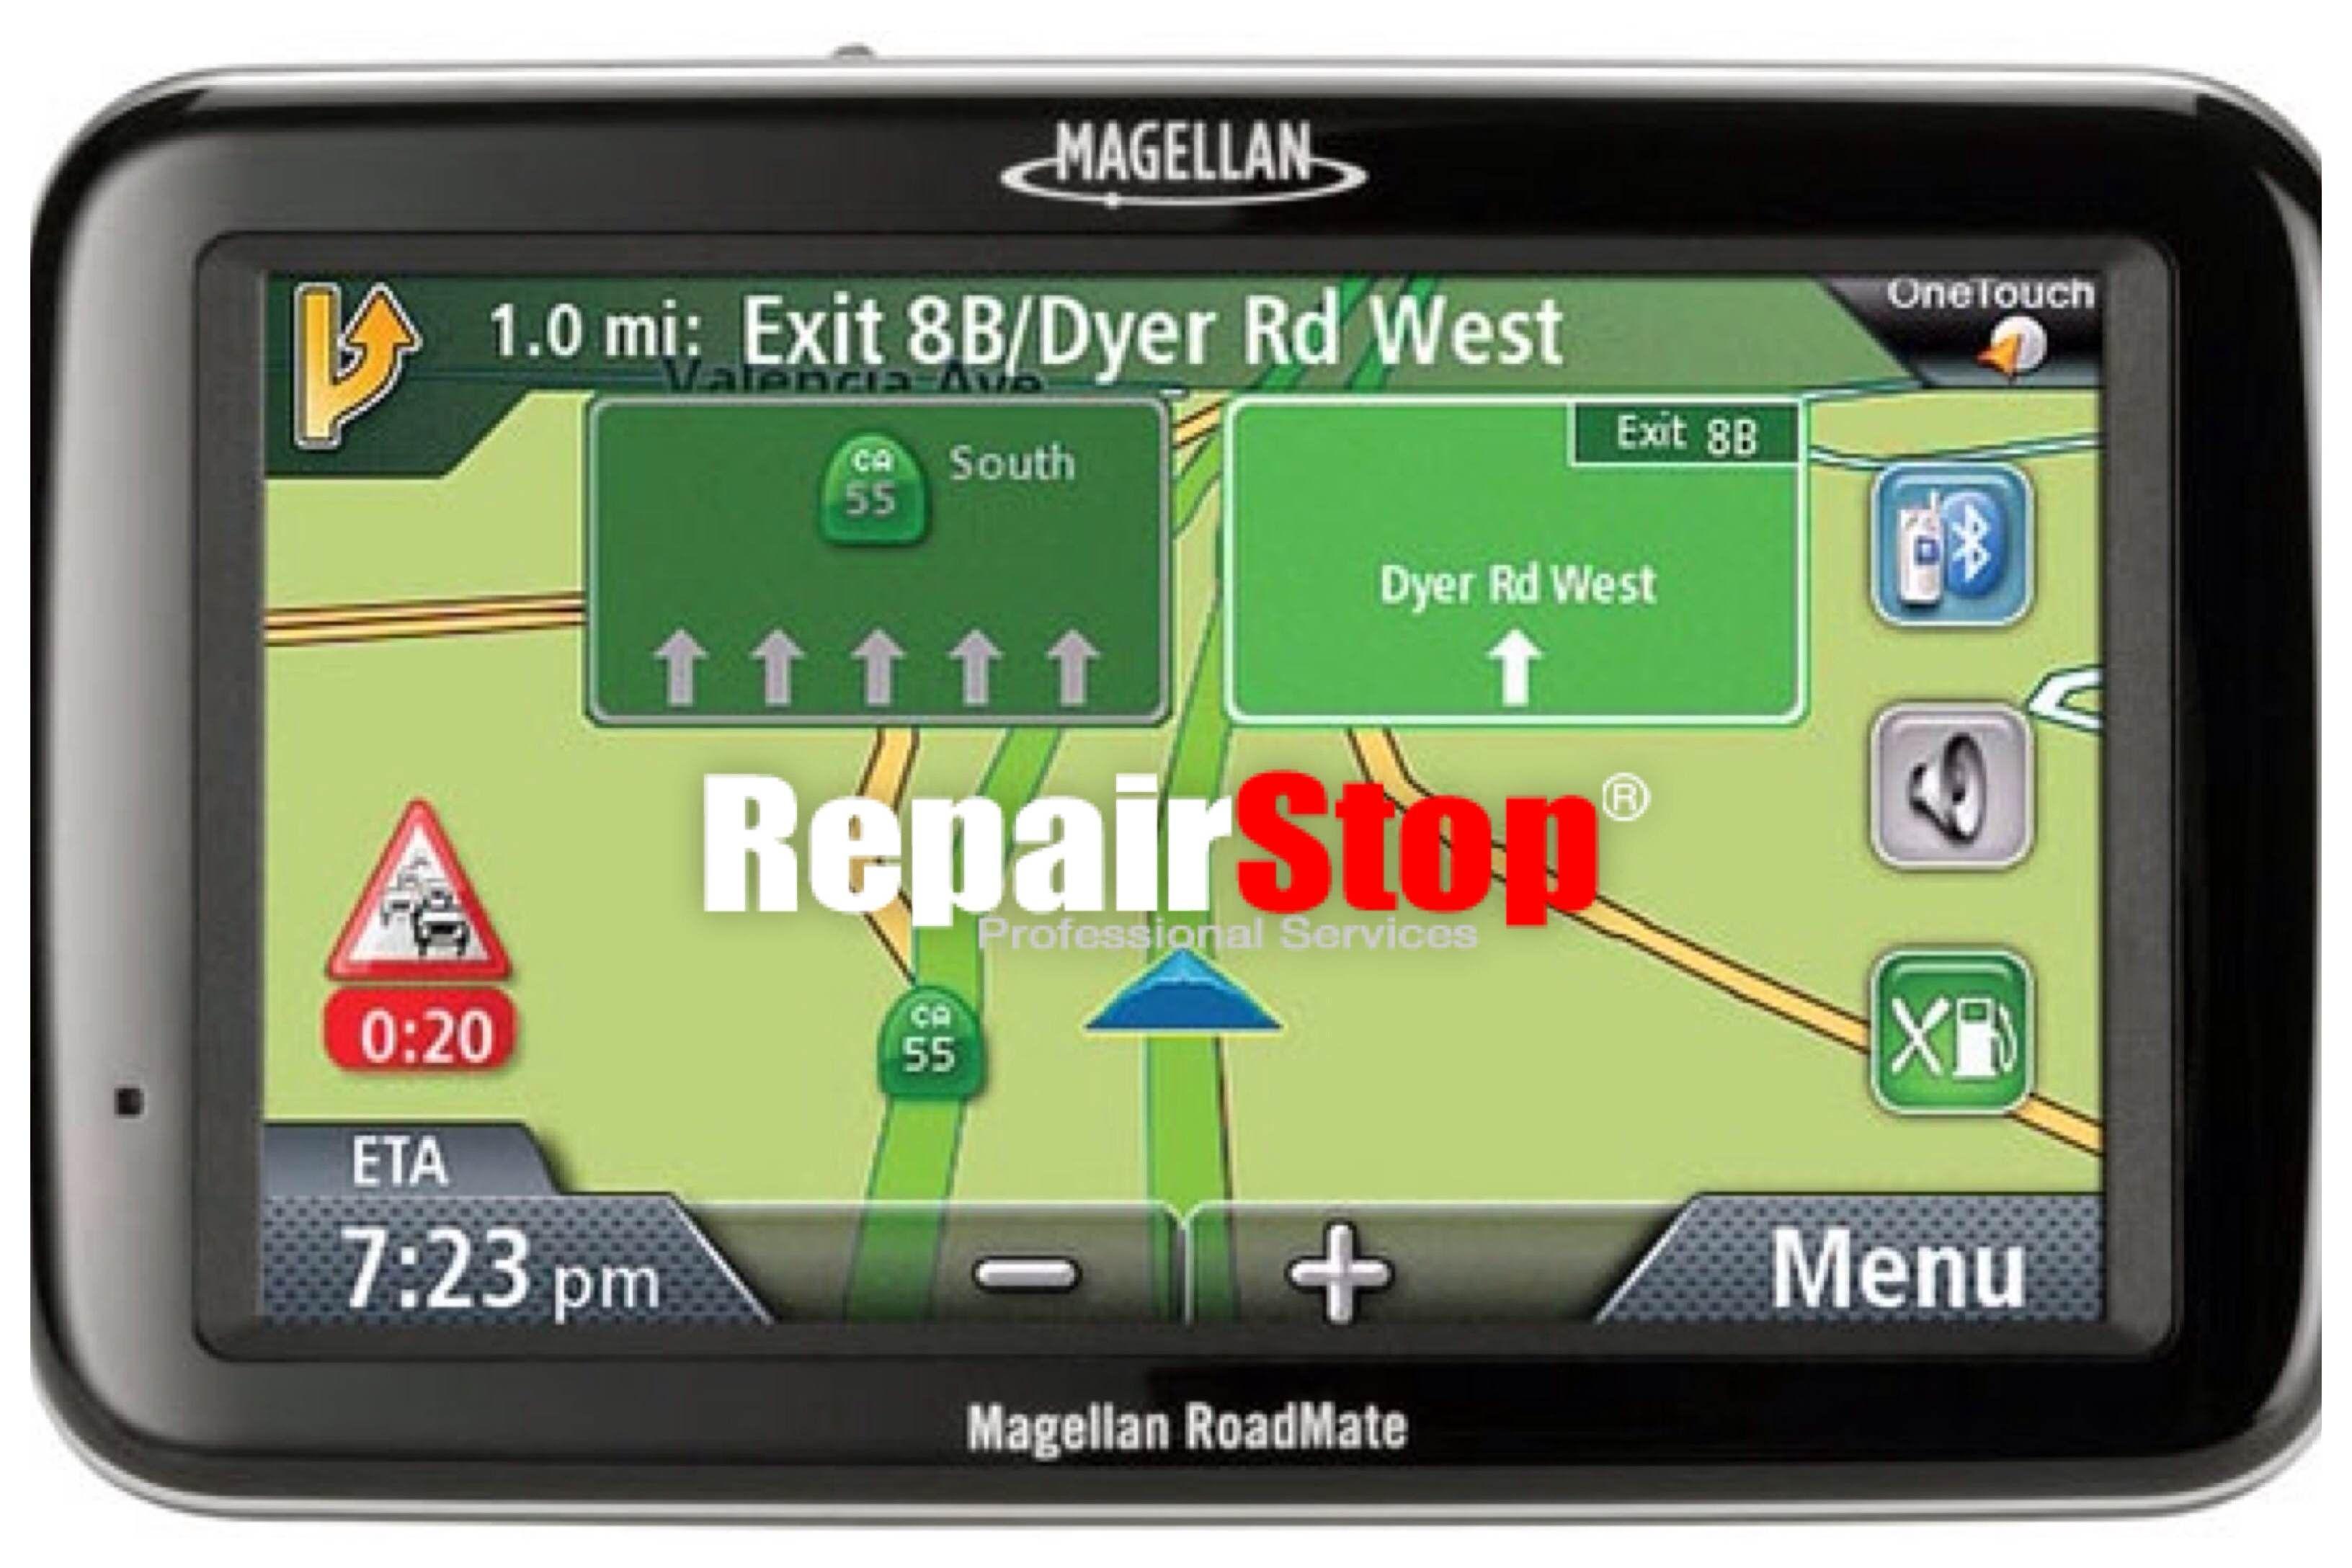 Gps Magellan Repair Services Gps Magellan Repair Services By Repair Stop We Specialize On